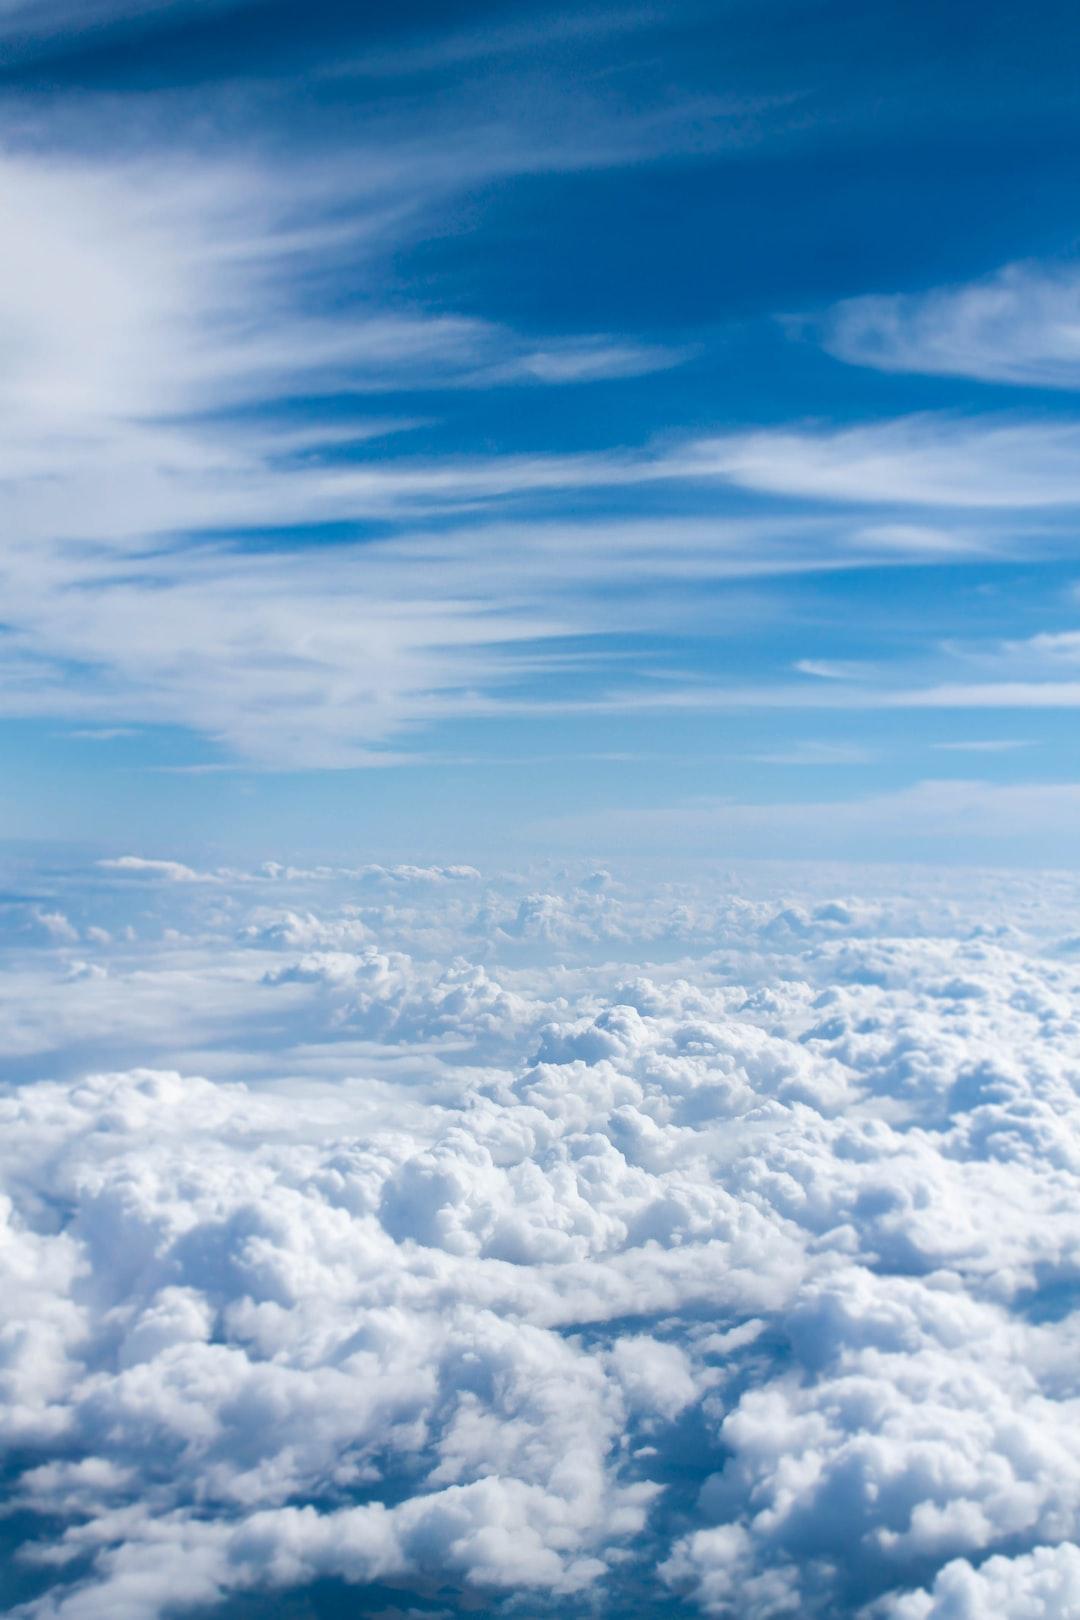 Sky Wallpapers: Free HD Download [500+ HQ] | Unsplash